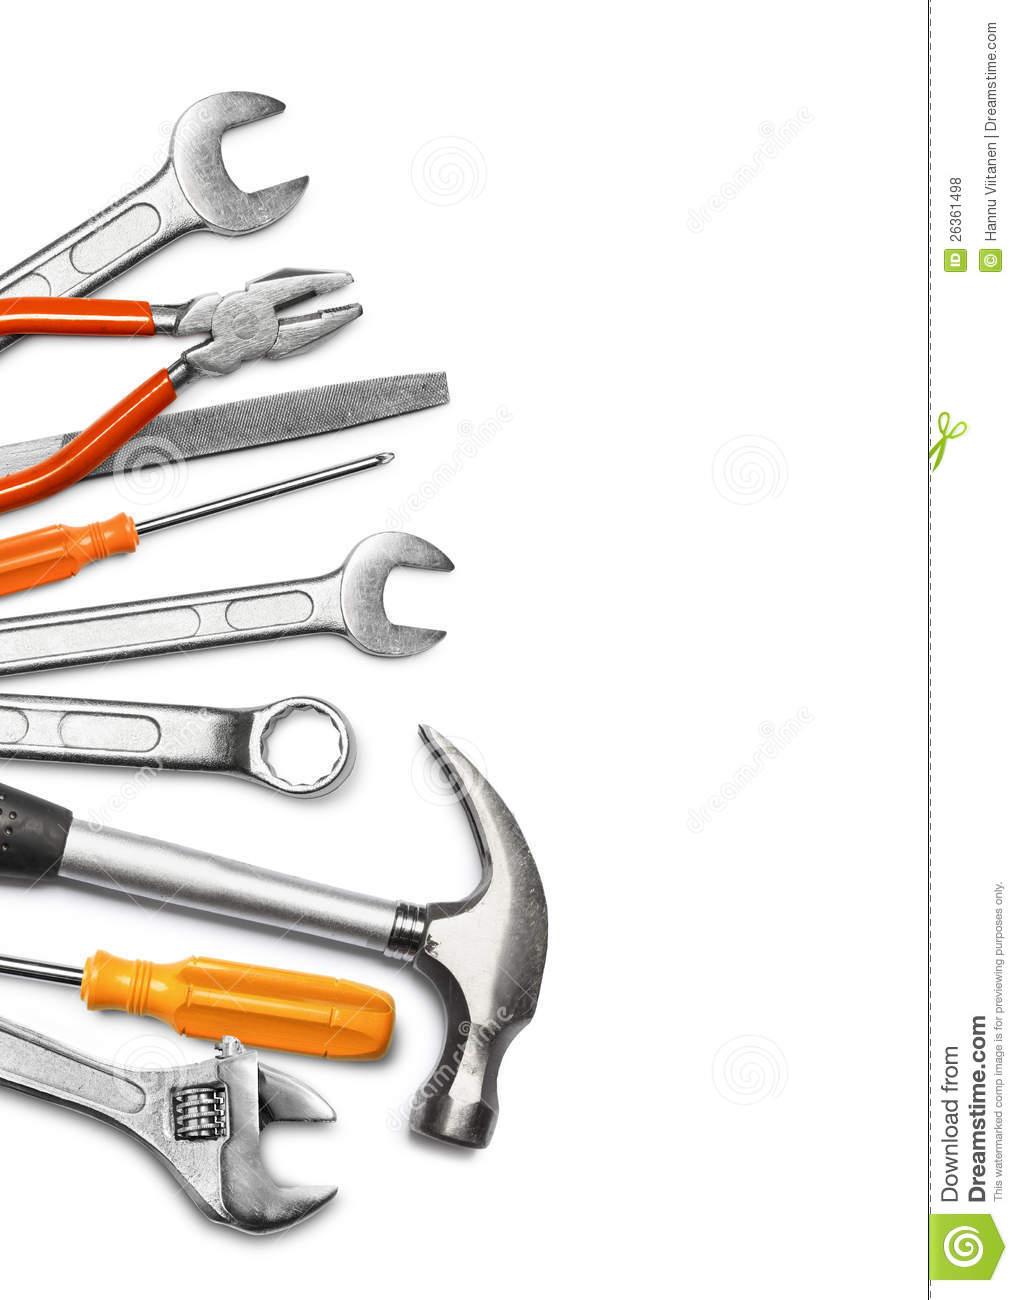 clipart mechanic tools - photo #23